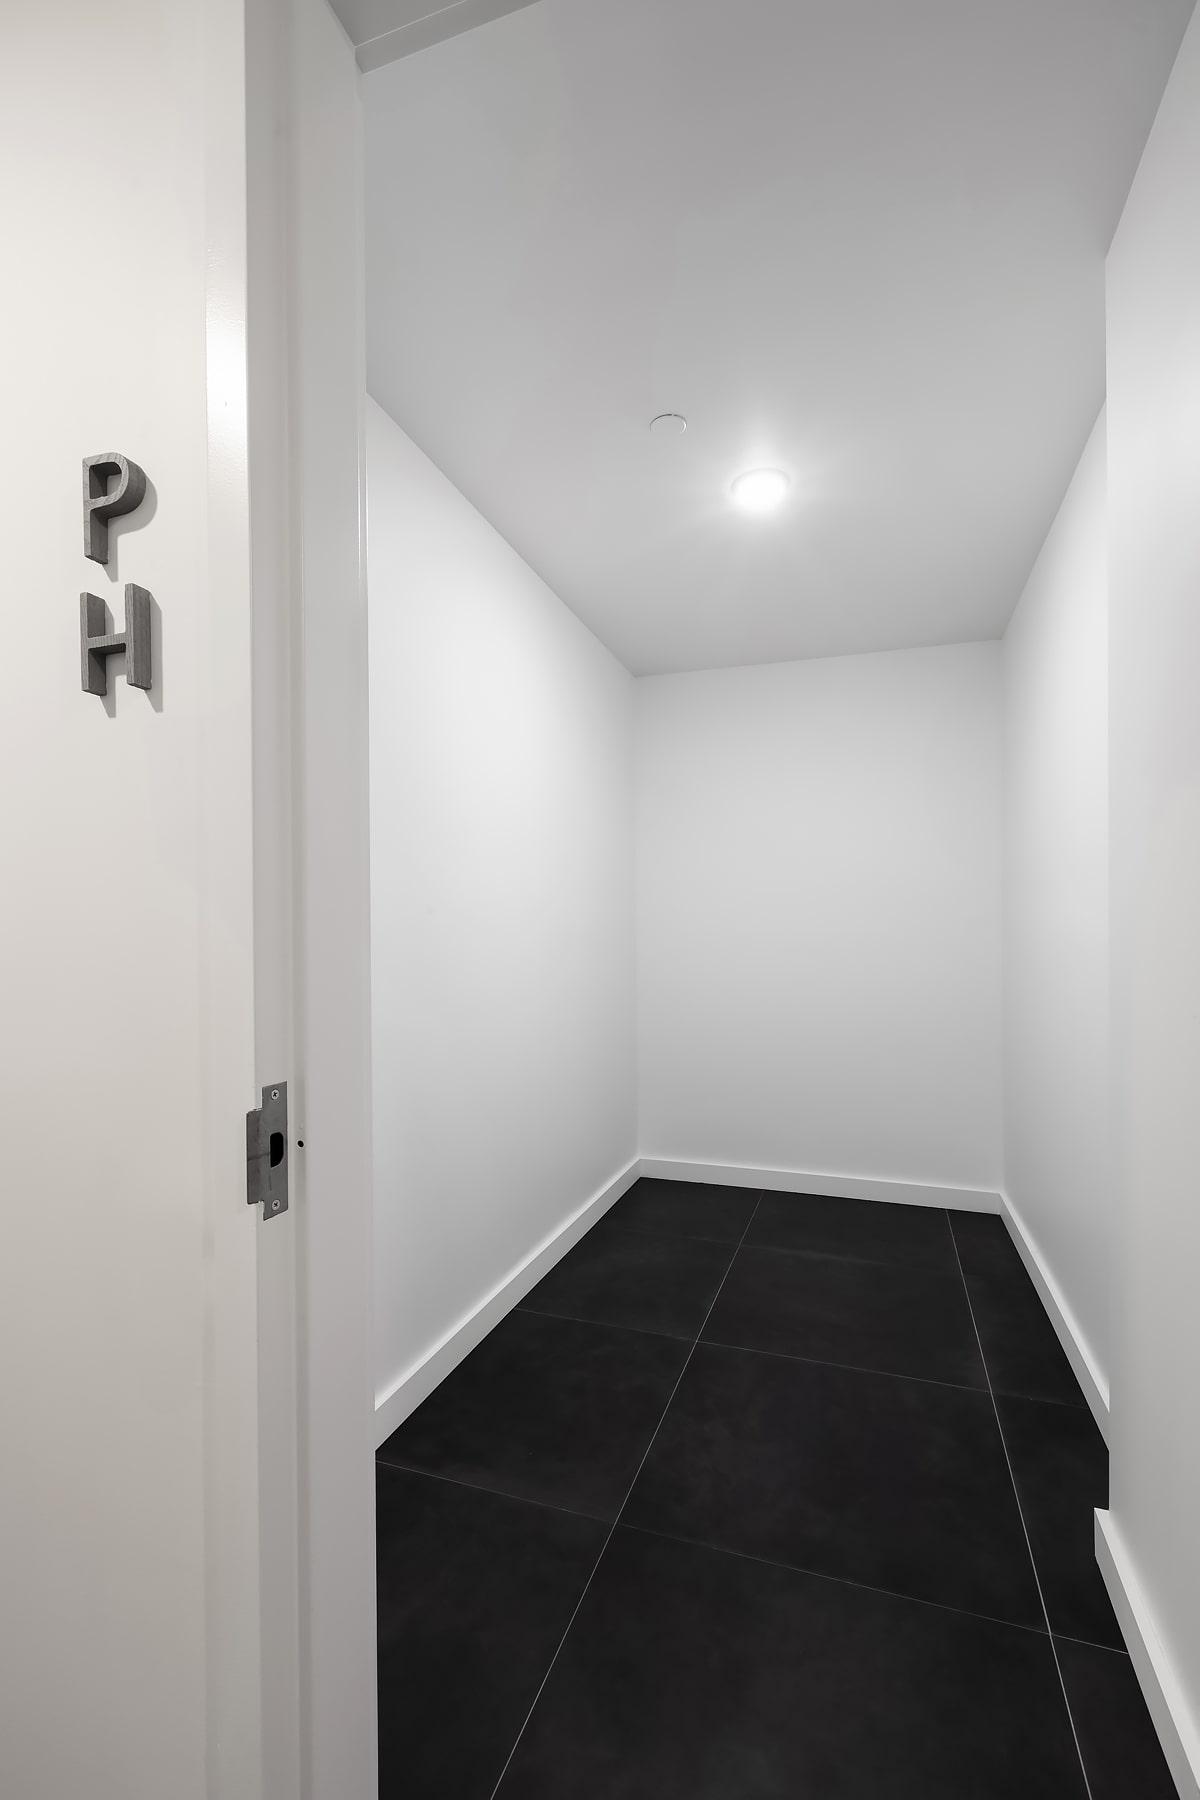 Penthouse storage